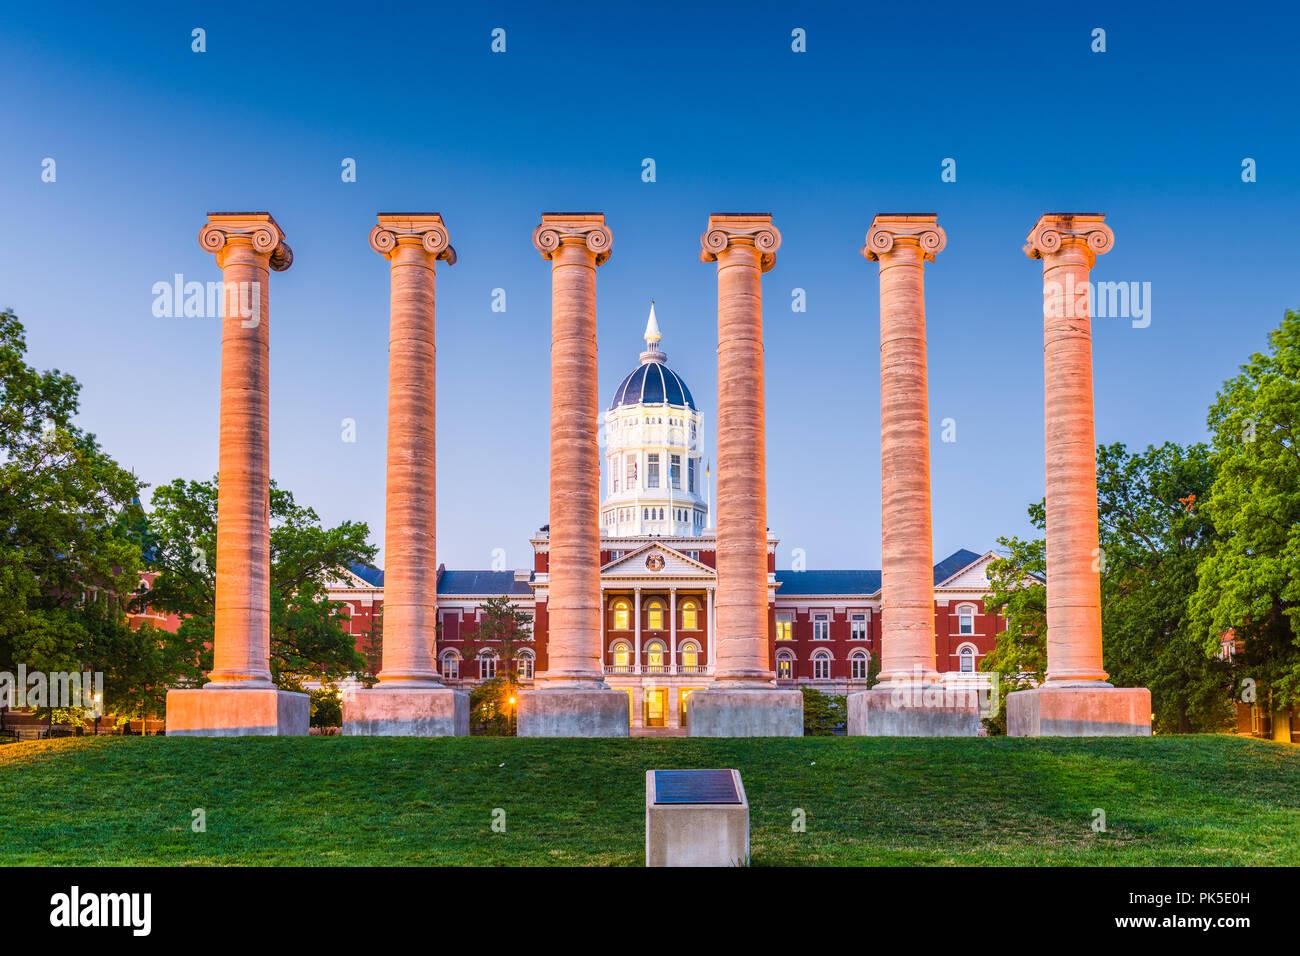 Columbia, Missouri, USA at The University of Missouri. Stock Photo